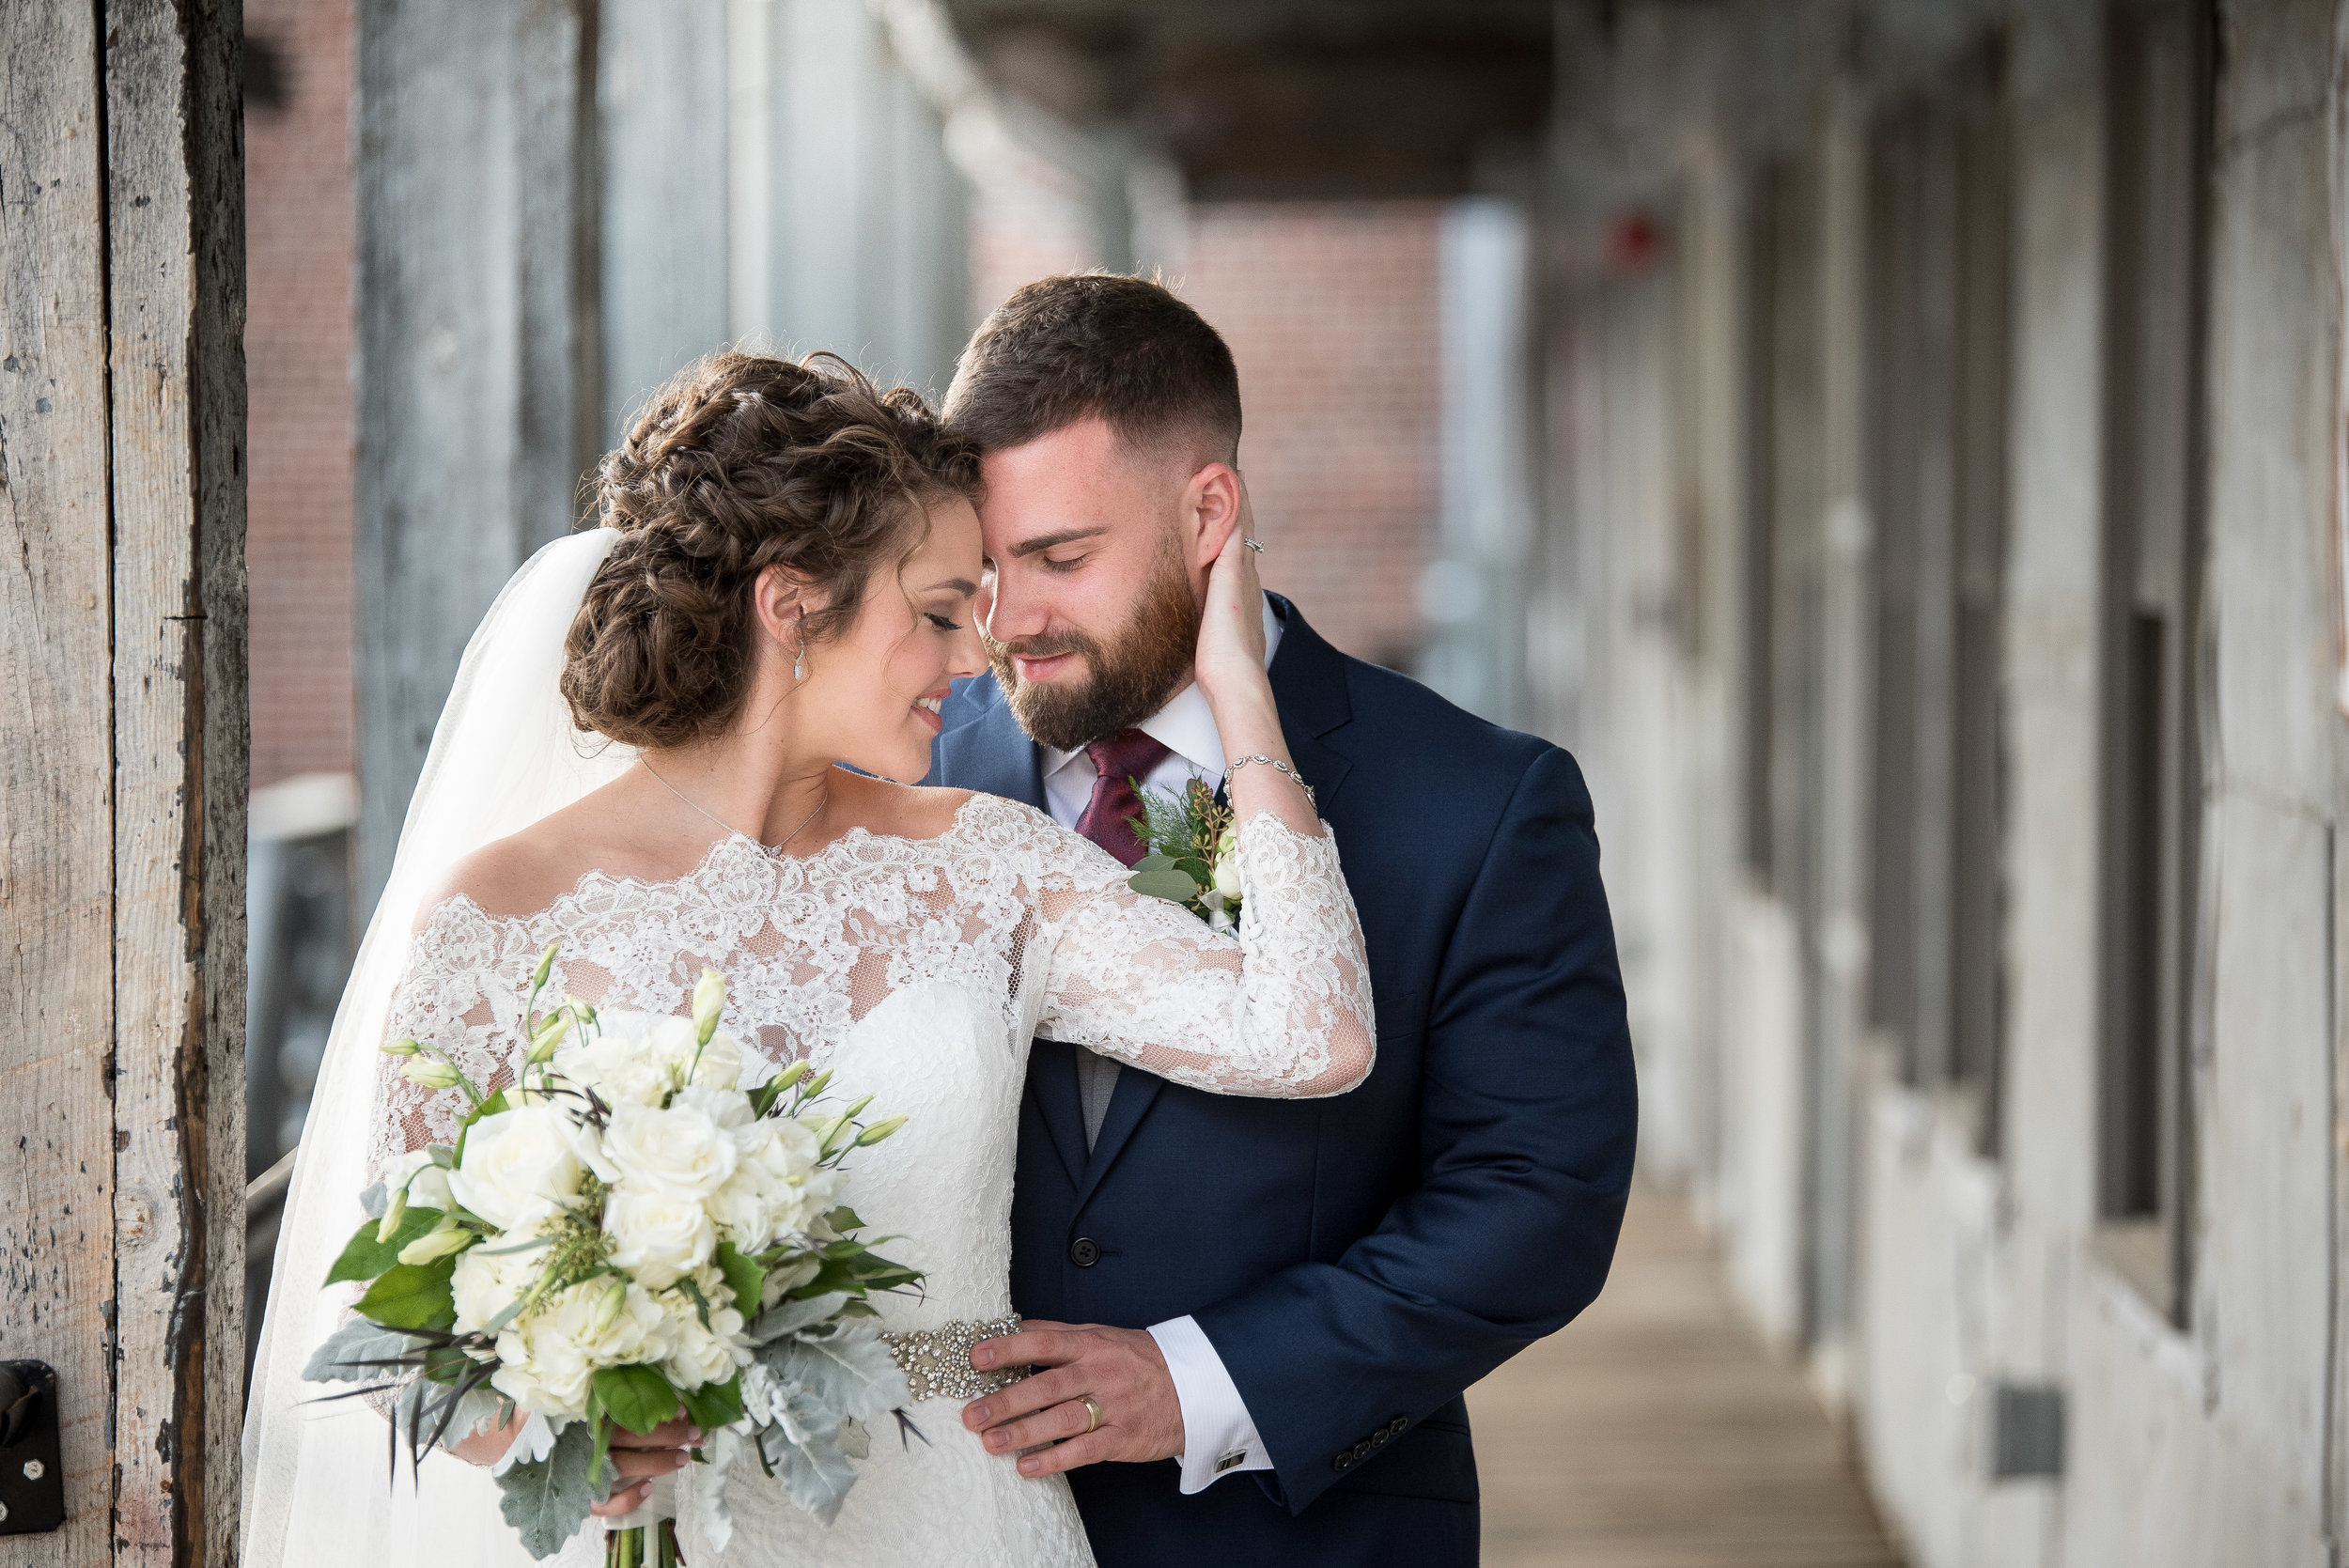 The Roller Mill Events - Winston Salem Weddings - NC Weddings - High Point NC Weddings - Winston Salem Venue - Yasmin Leonard Photography-40.jpg